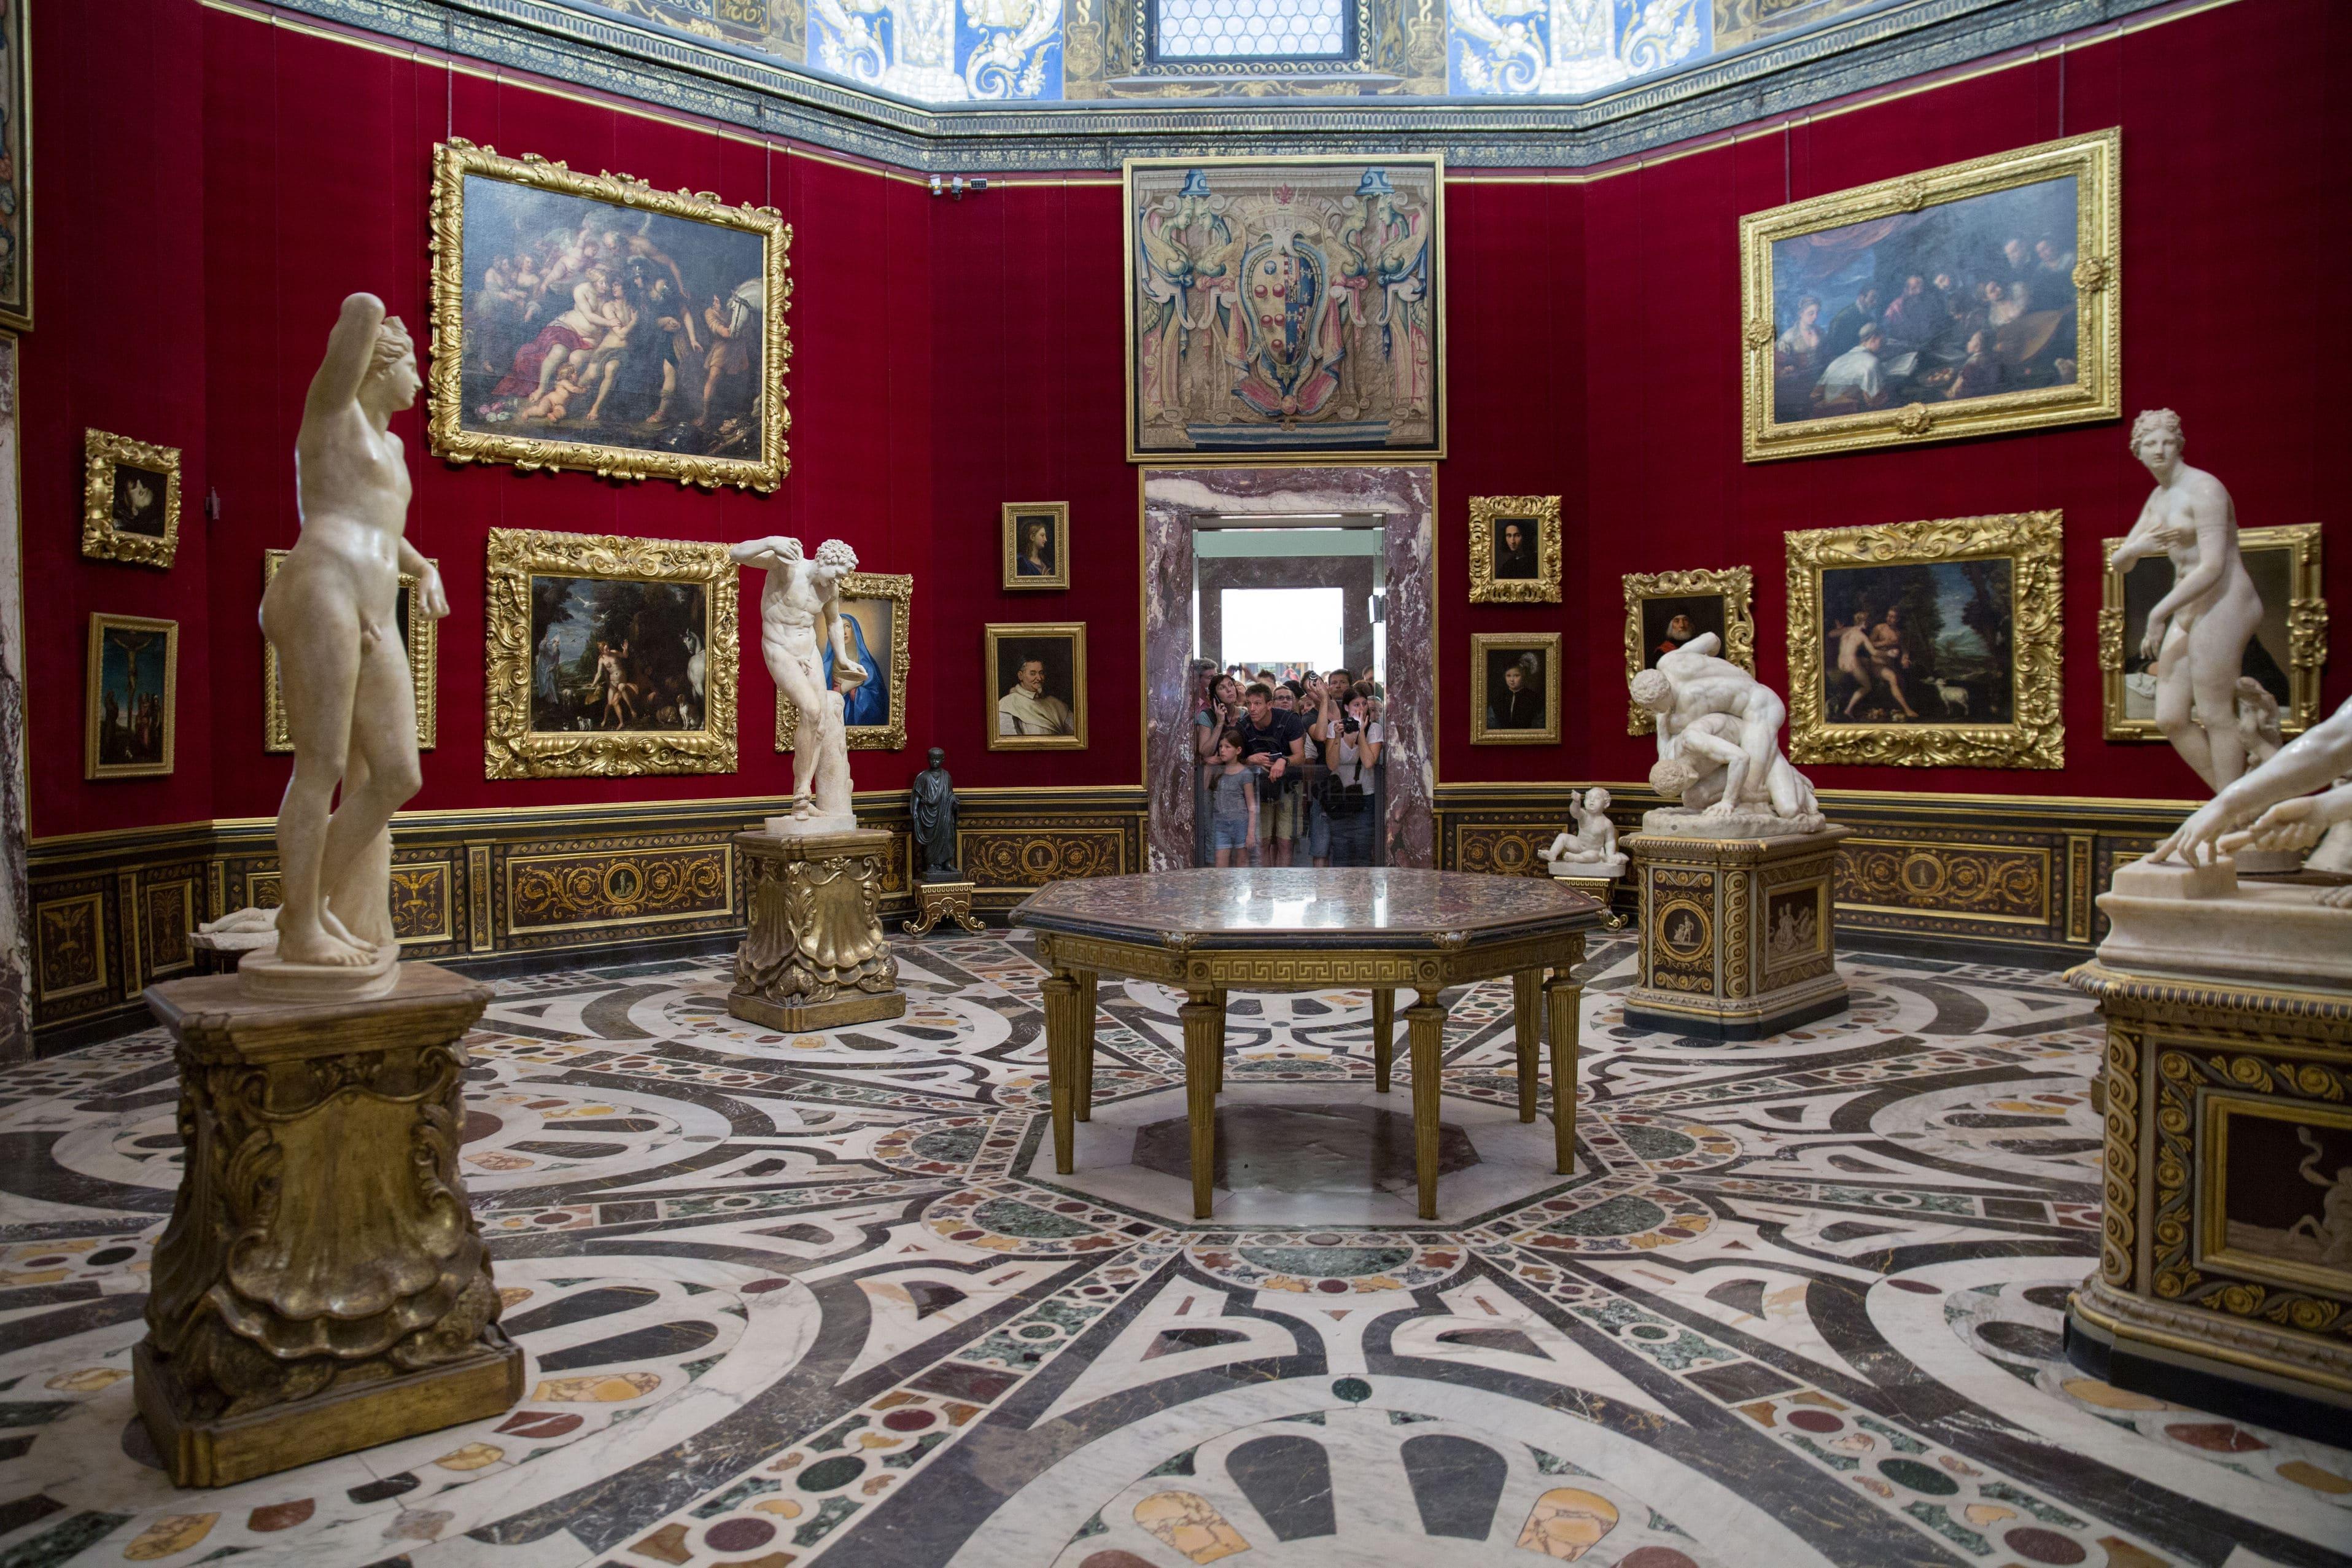 Uffizi Gallery - Leonardo da Vinci